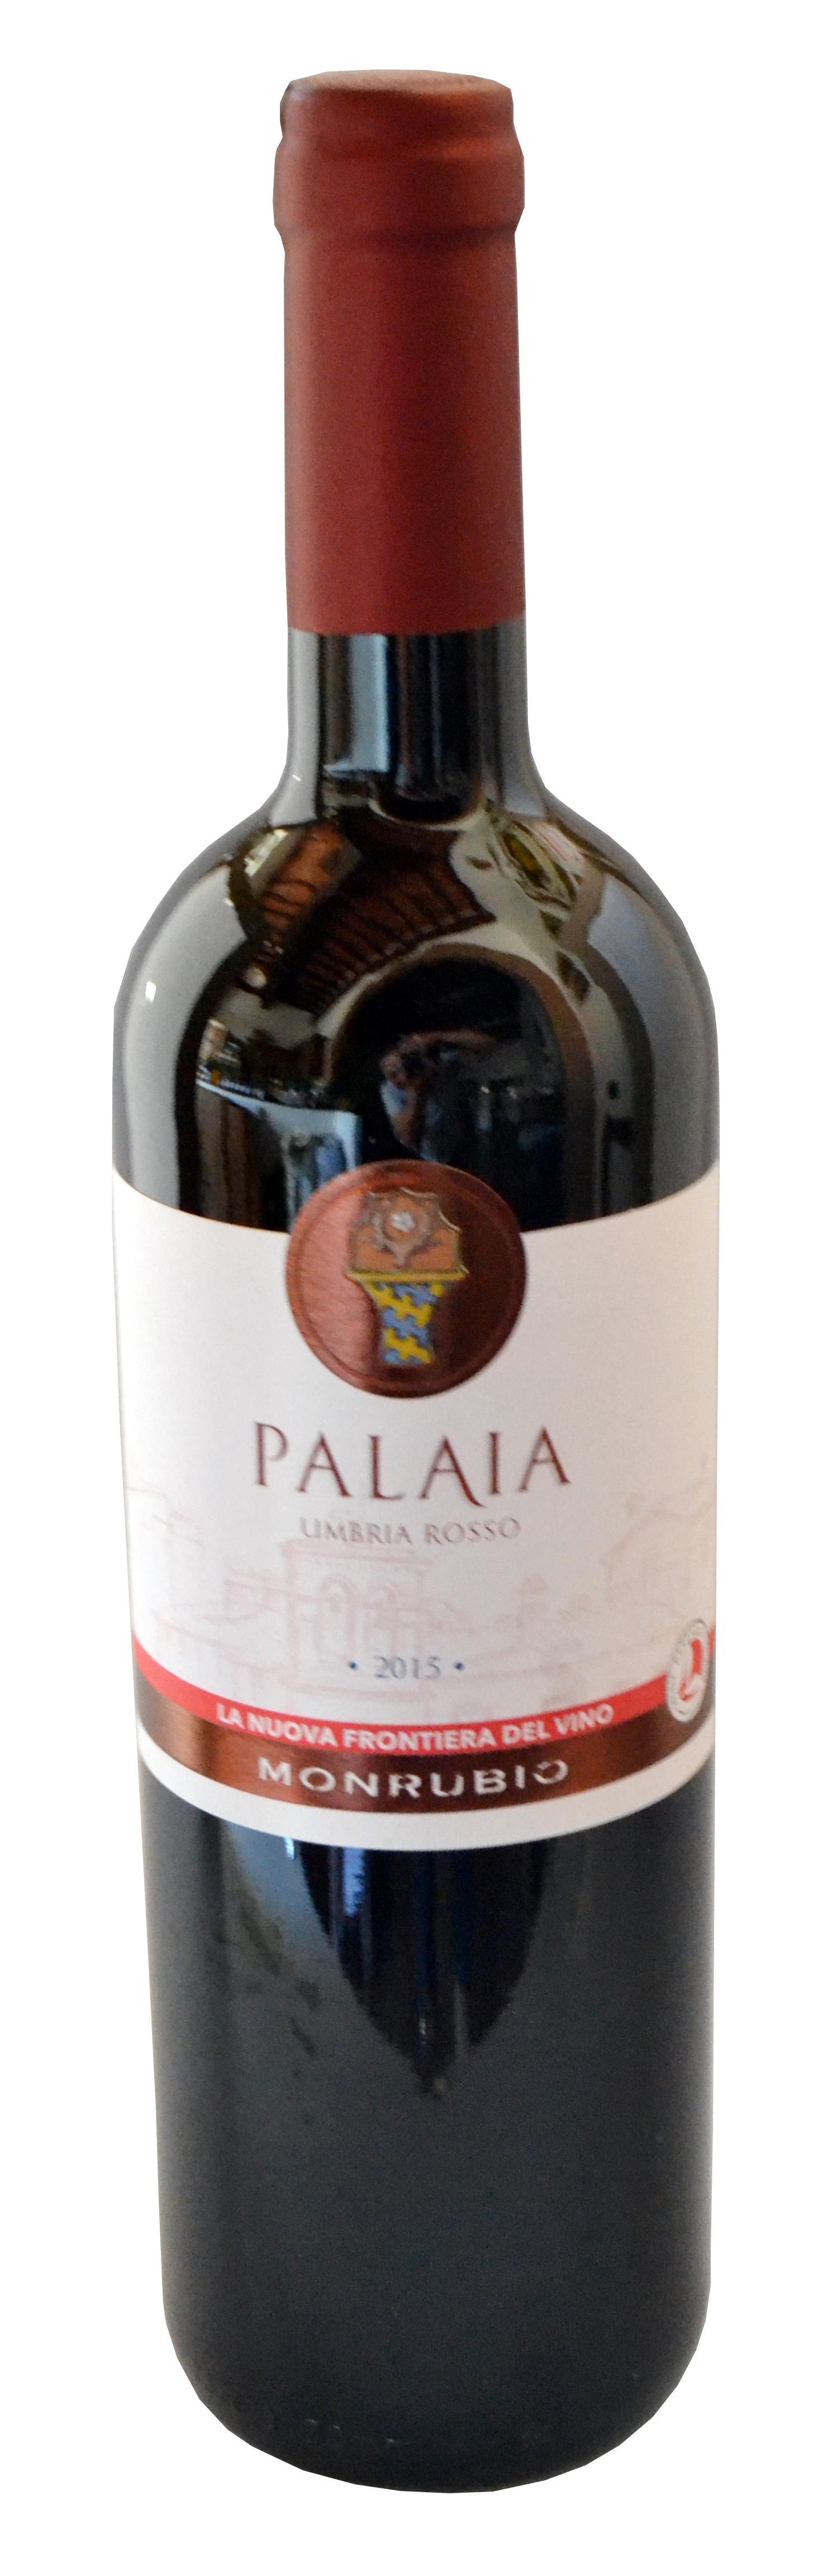 Vino Rosso dell'Umbria IGT bottiglia da lt. 0,75